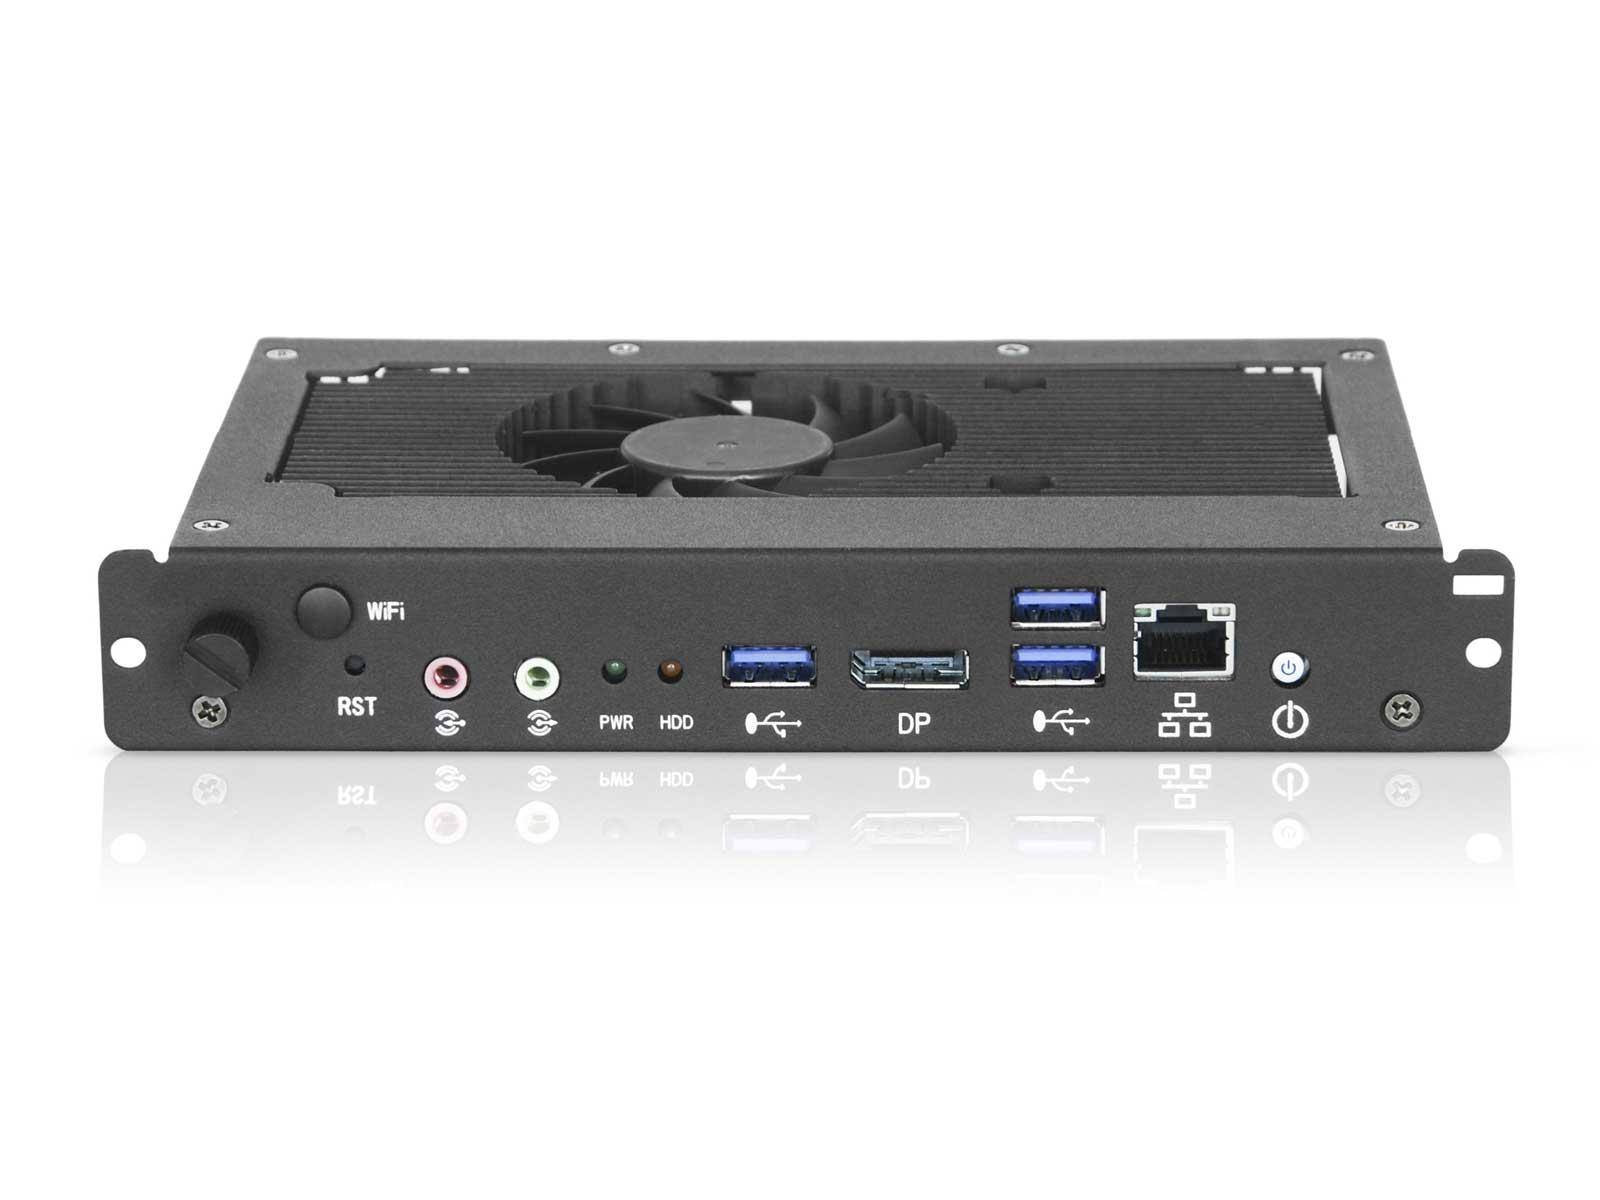 NEC OPS-Sky-Cel-d4/64/W7e A 2.4 GHz Intel® Celeron® G 64 GB SSD 4 GB